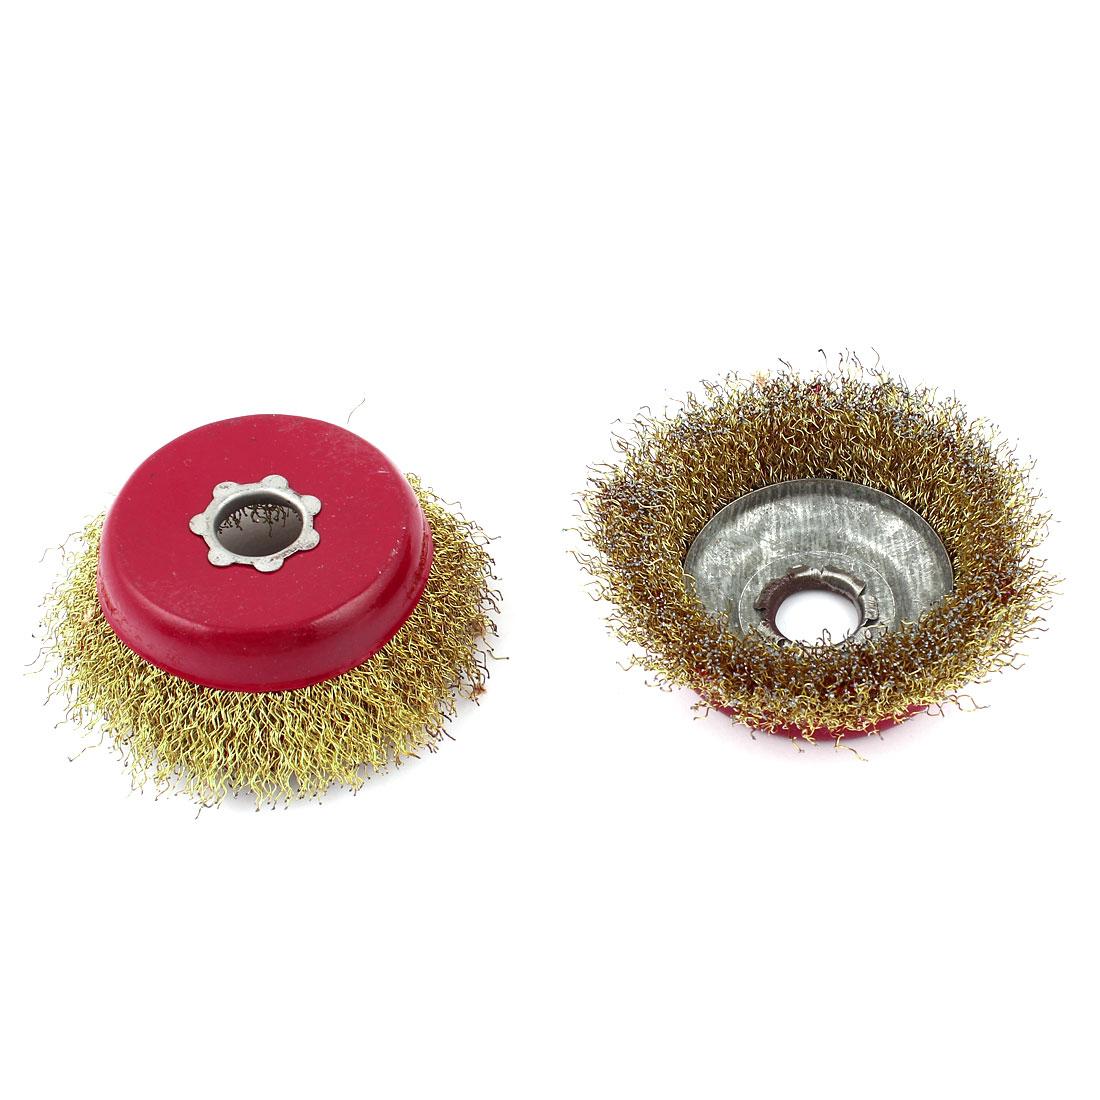 2 Pcs 9cm Bristle Brush Gold Tone Red for 16mm Diameter Shank forDremel Rotary Tool